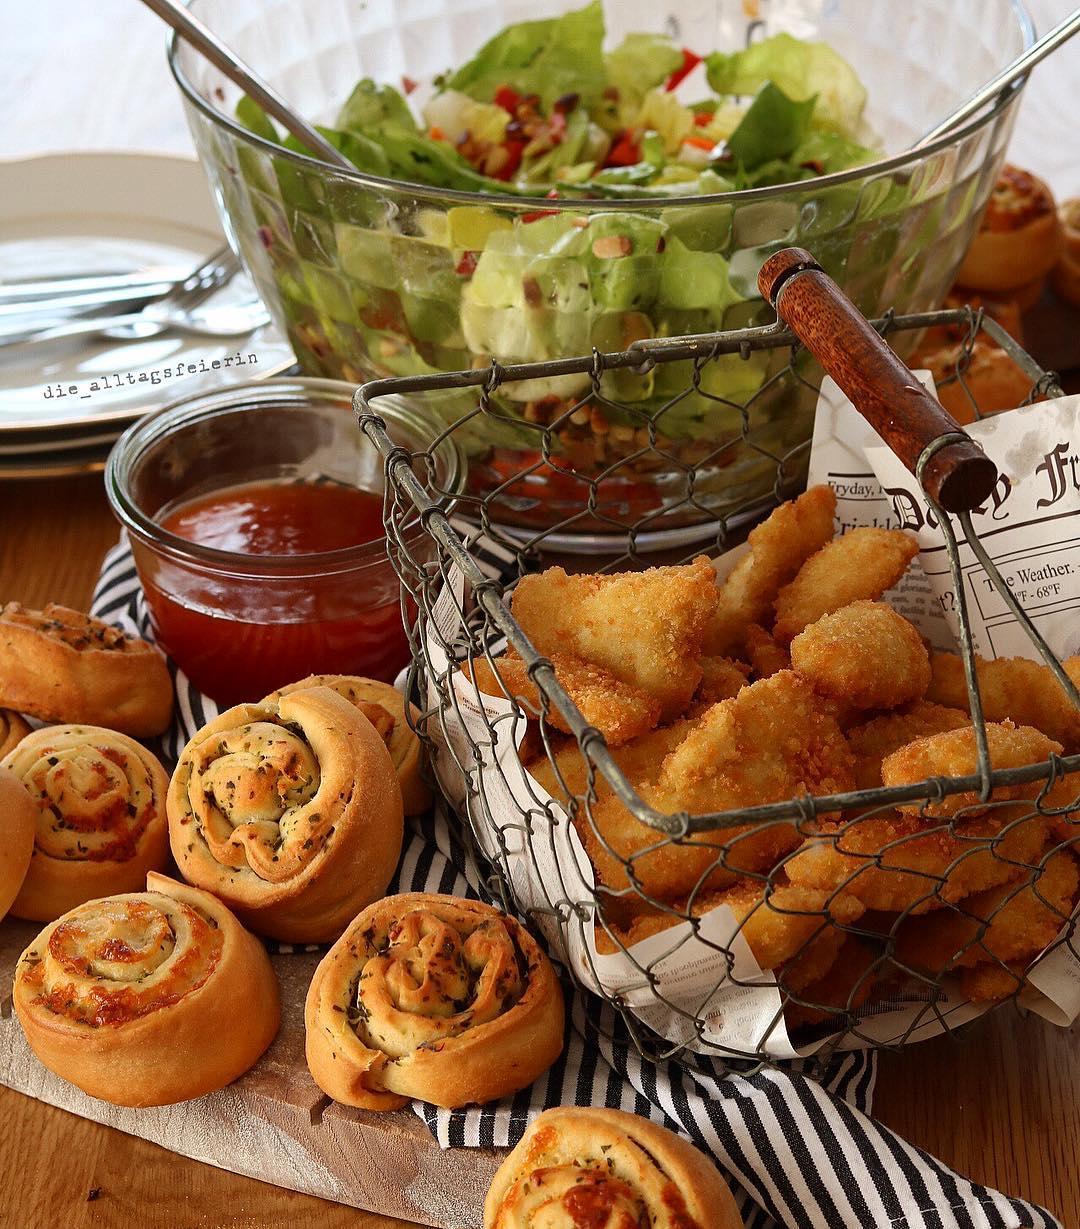 Salat, Fingerfood, Honig-Senf-Dressing, Pinienkerne, Wochenplan, Speiseplan, Essensplan, Freebie, Freebie Wochenplan